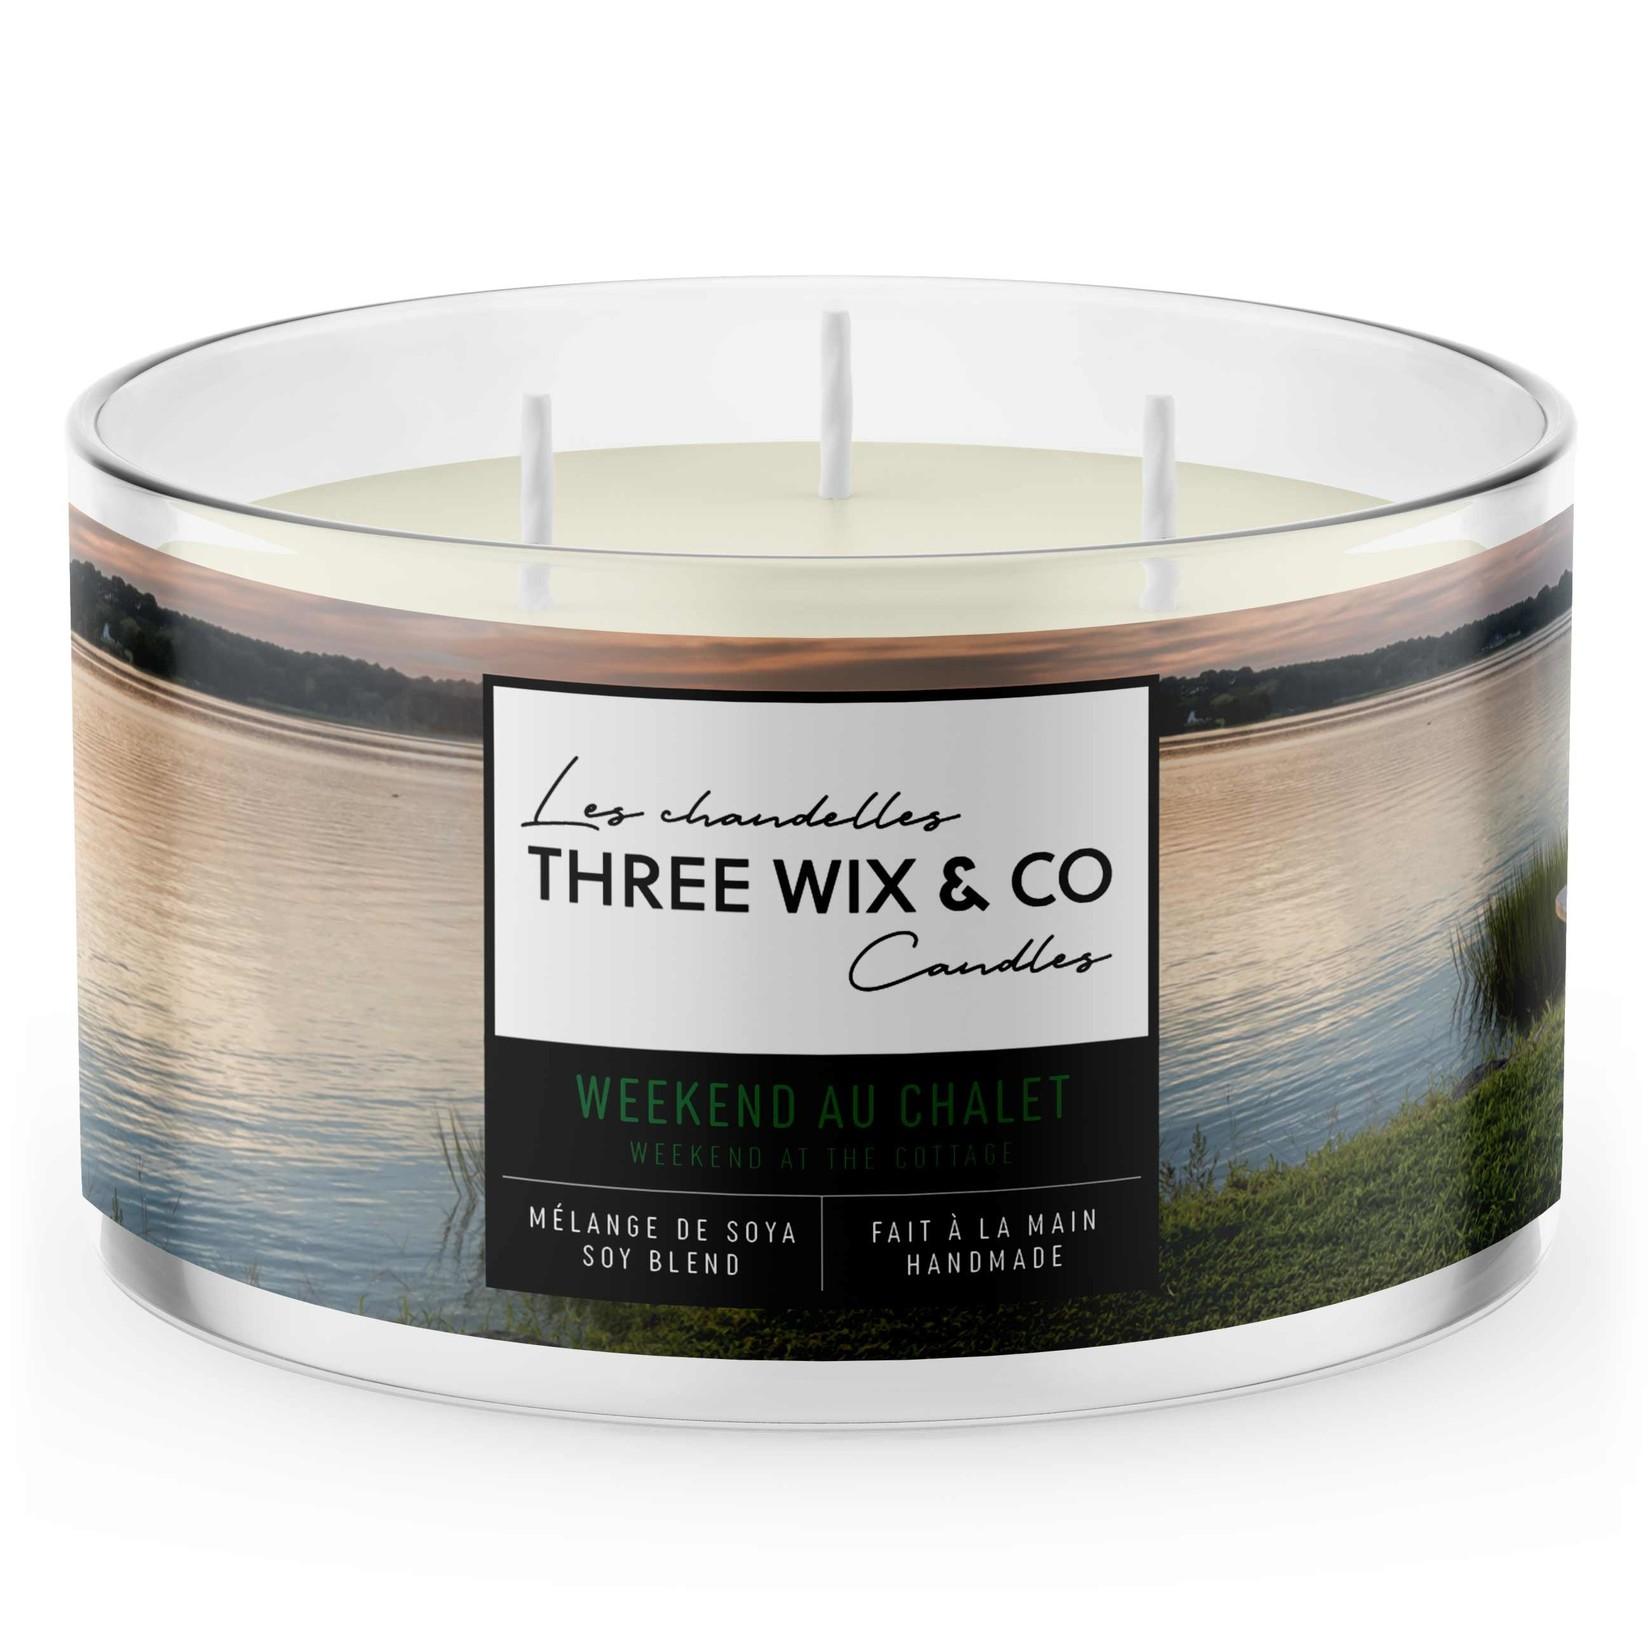 Three wix & co Weekend au chalet - Three wix & co